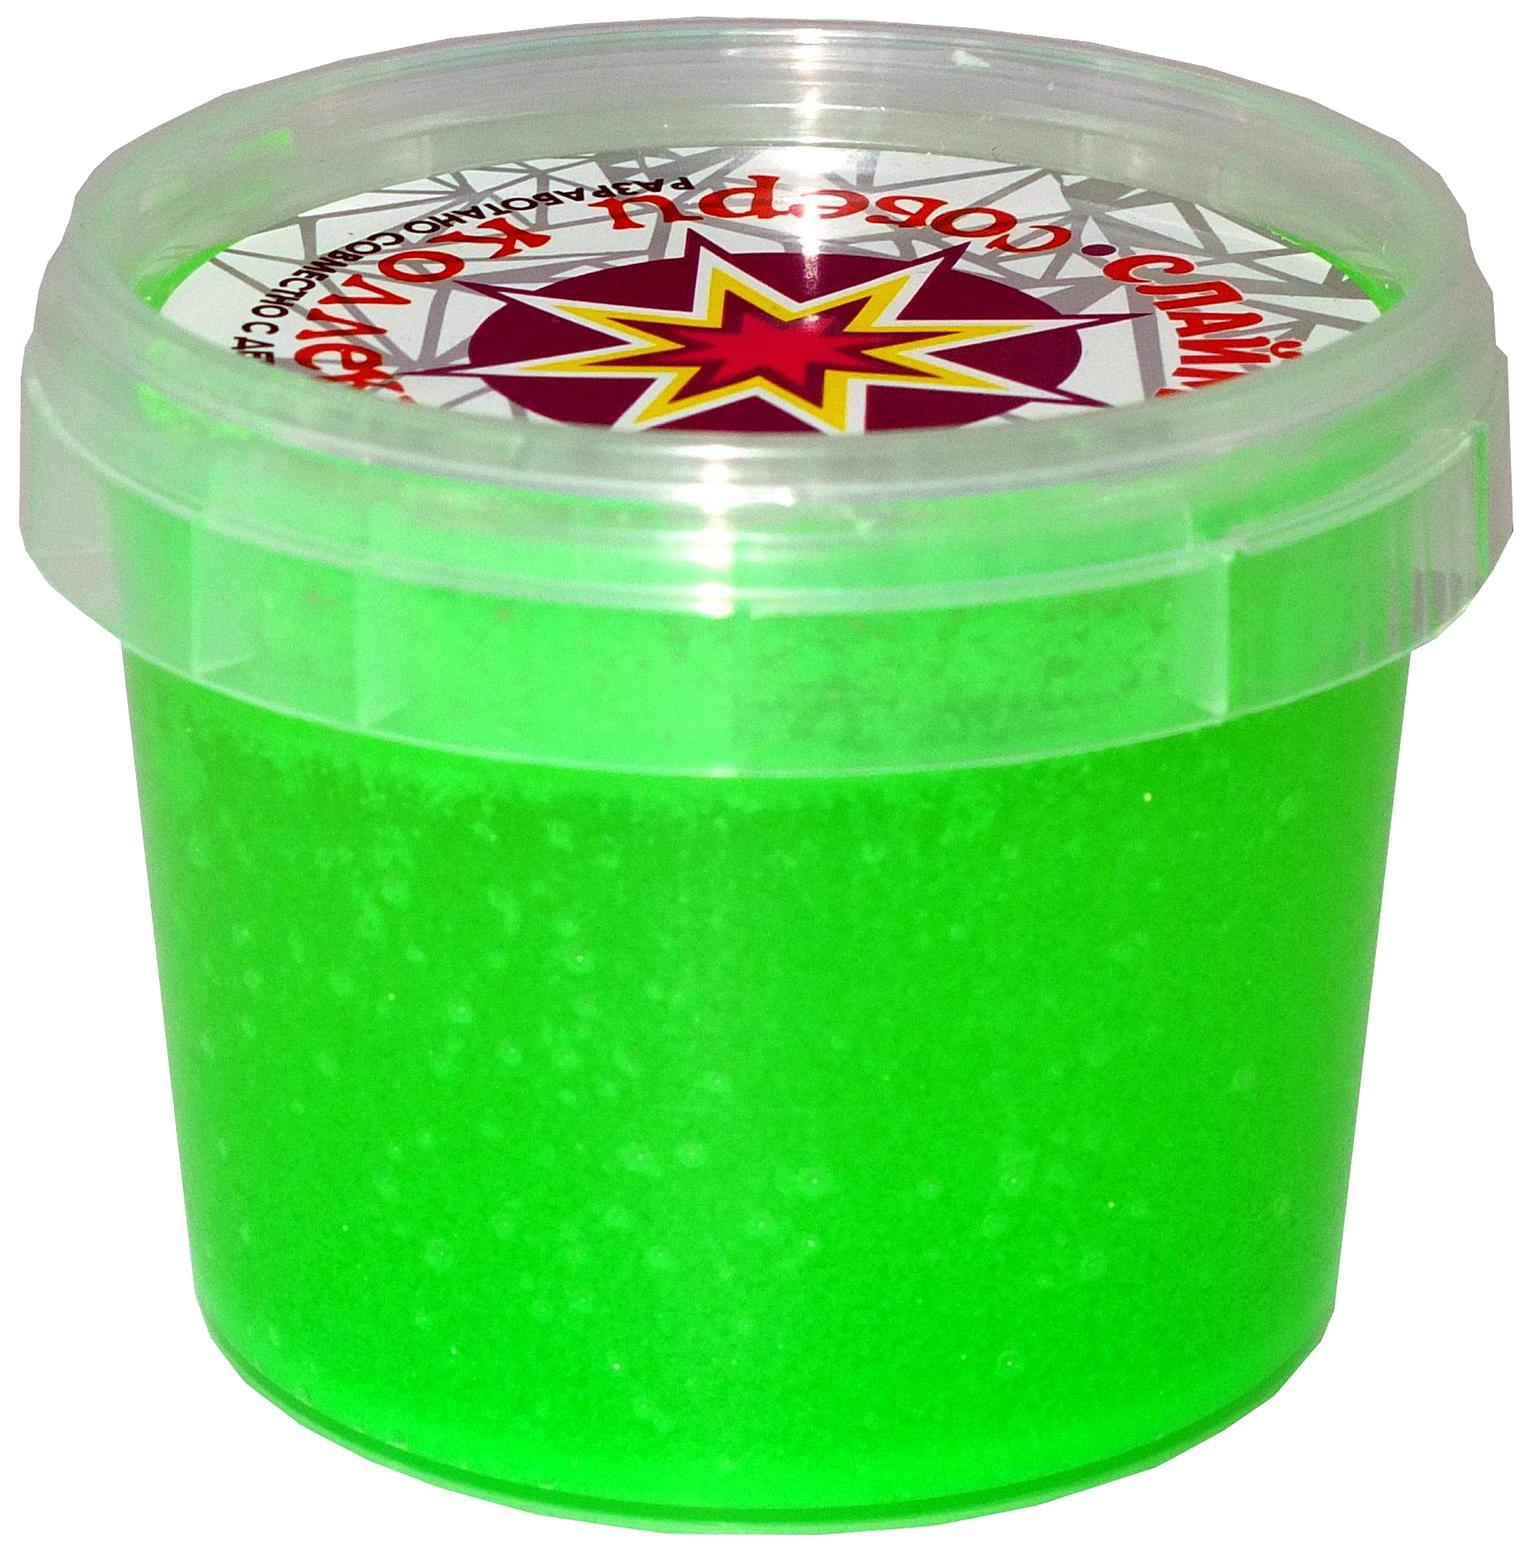 Слайм Новая Химия Стекло Party Slime